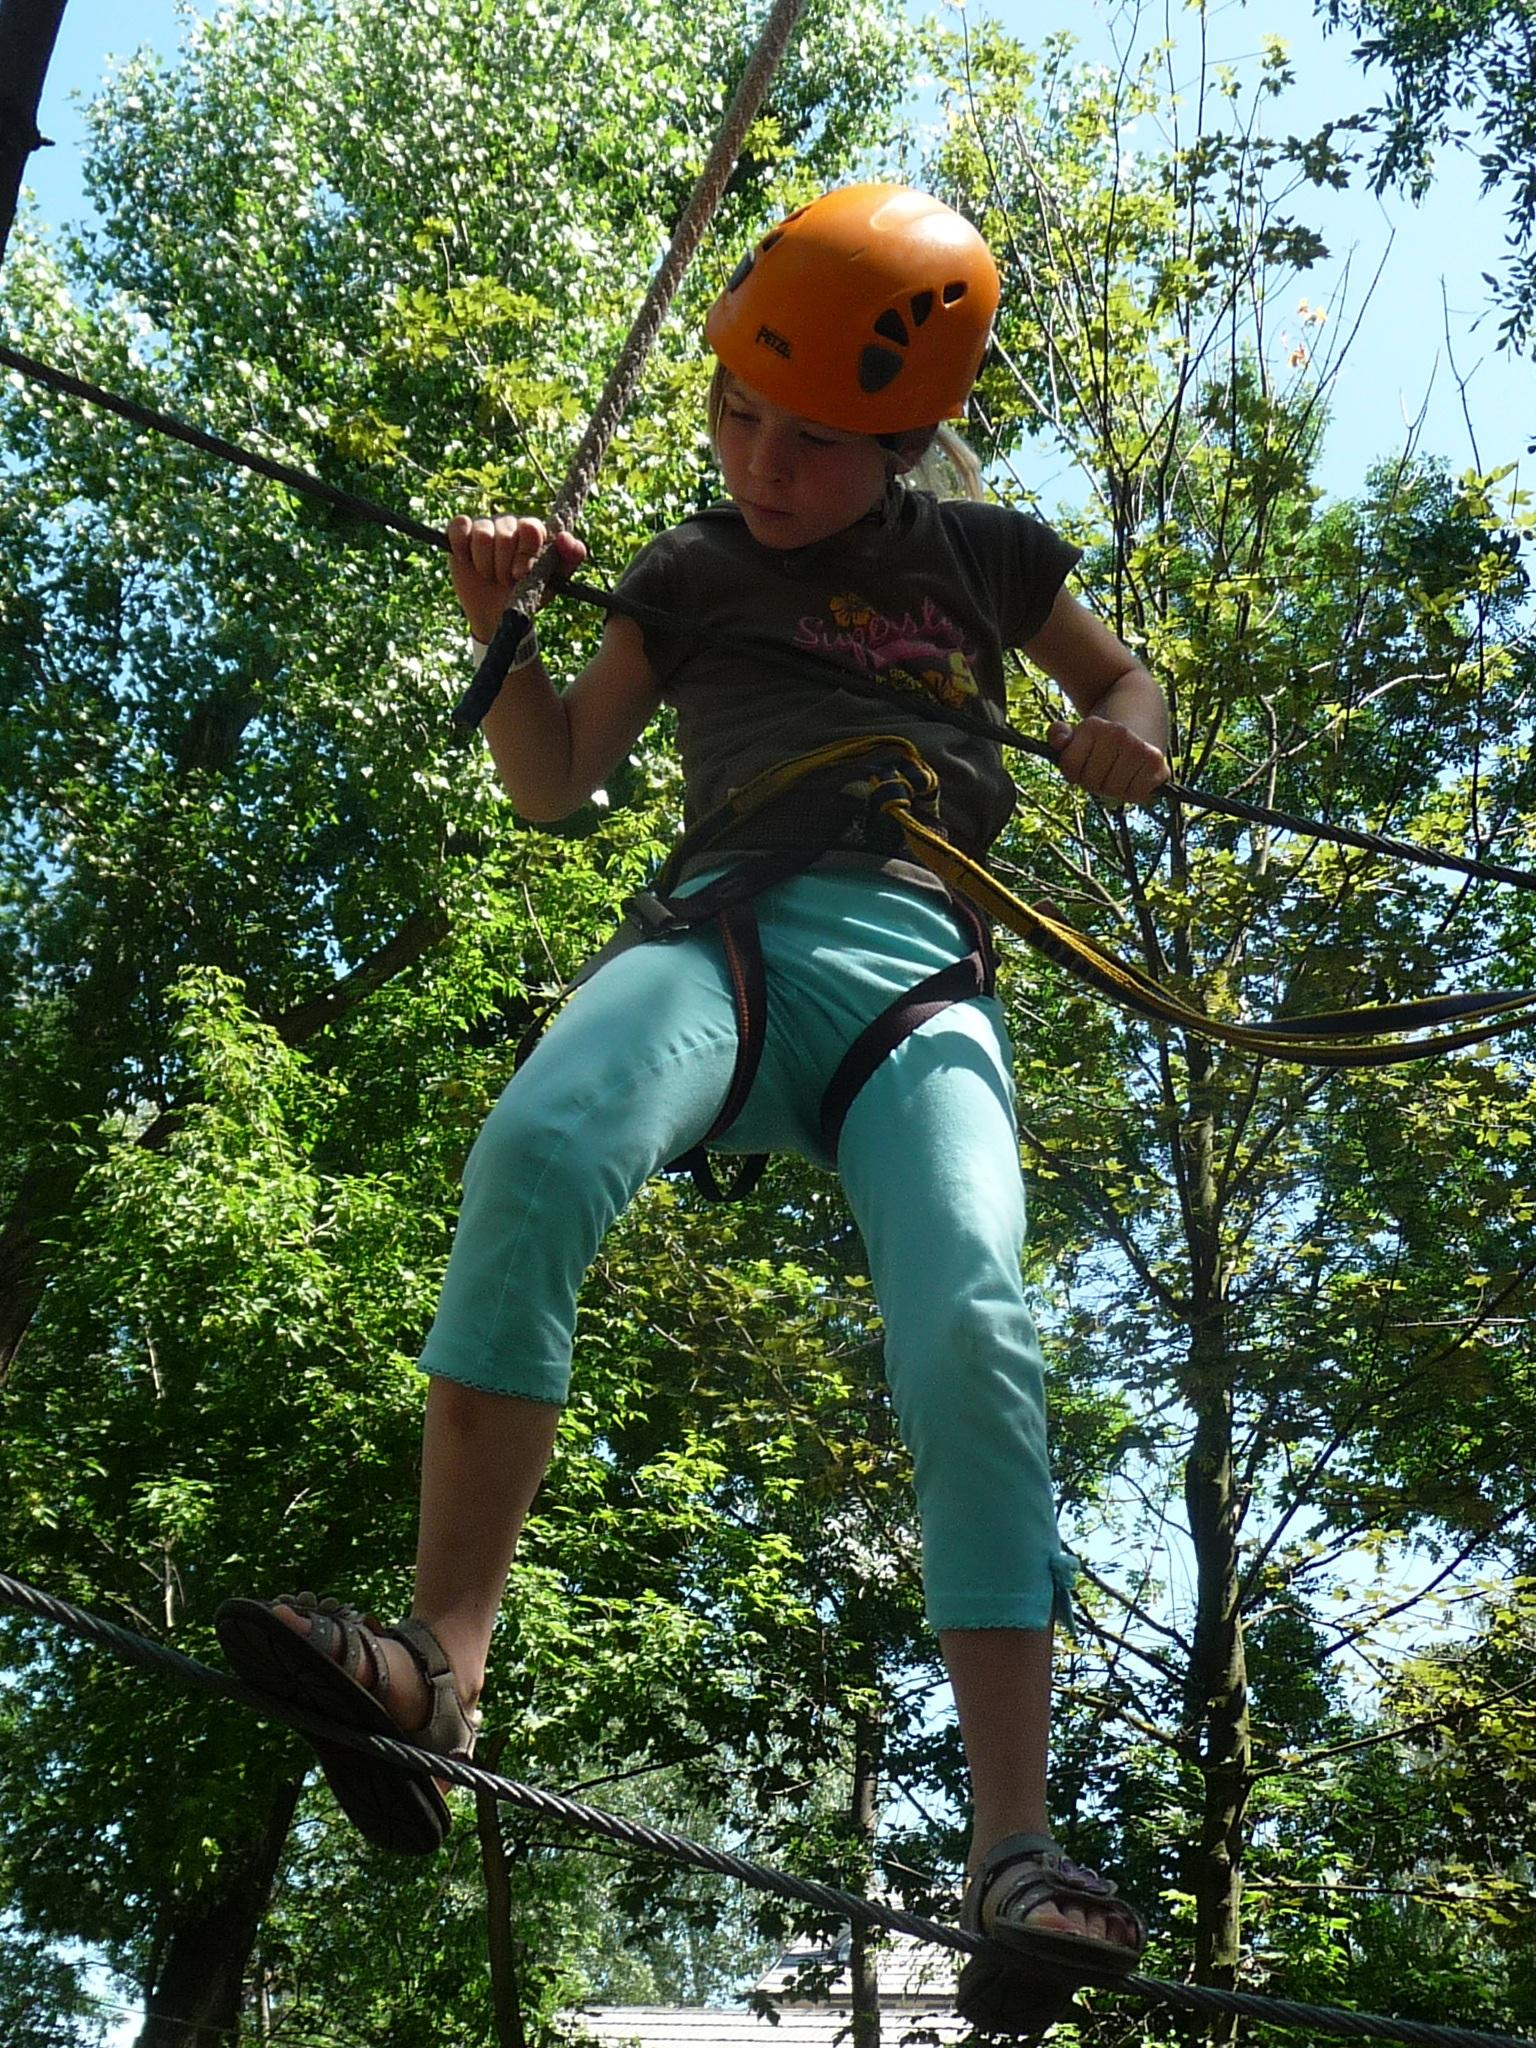 Free Images : tree, adventure, jungle, balance, child ...